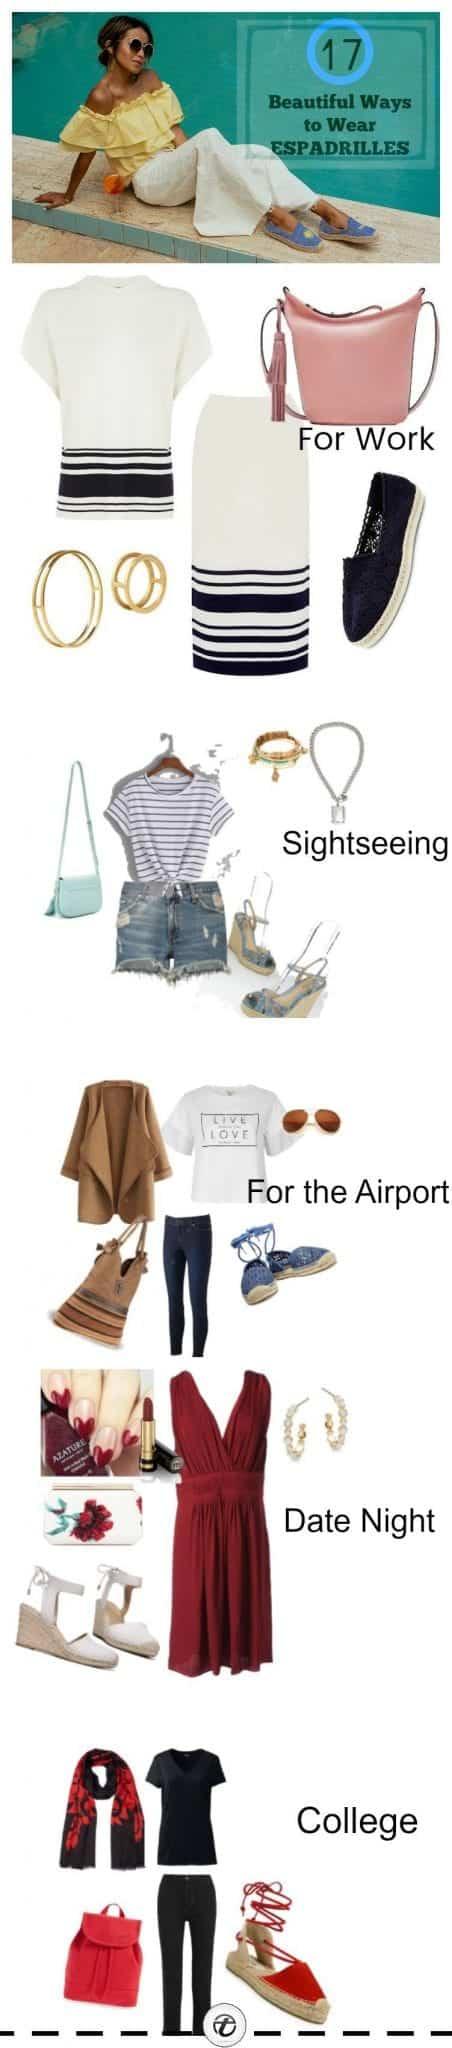 different-ways-to-wear-espadrilles-for-women Outfits With Espadrilles–17 Ideas How To Wear Espadrilles